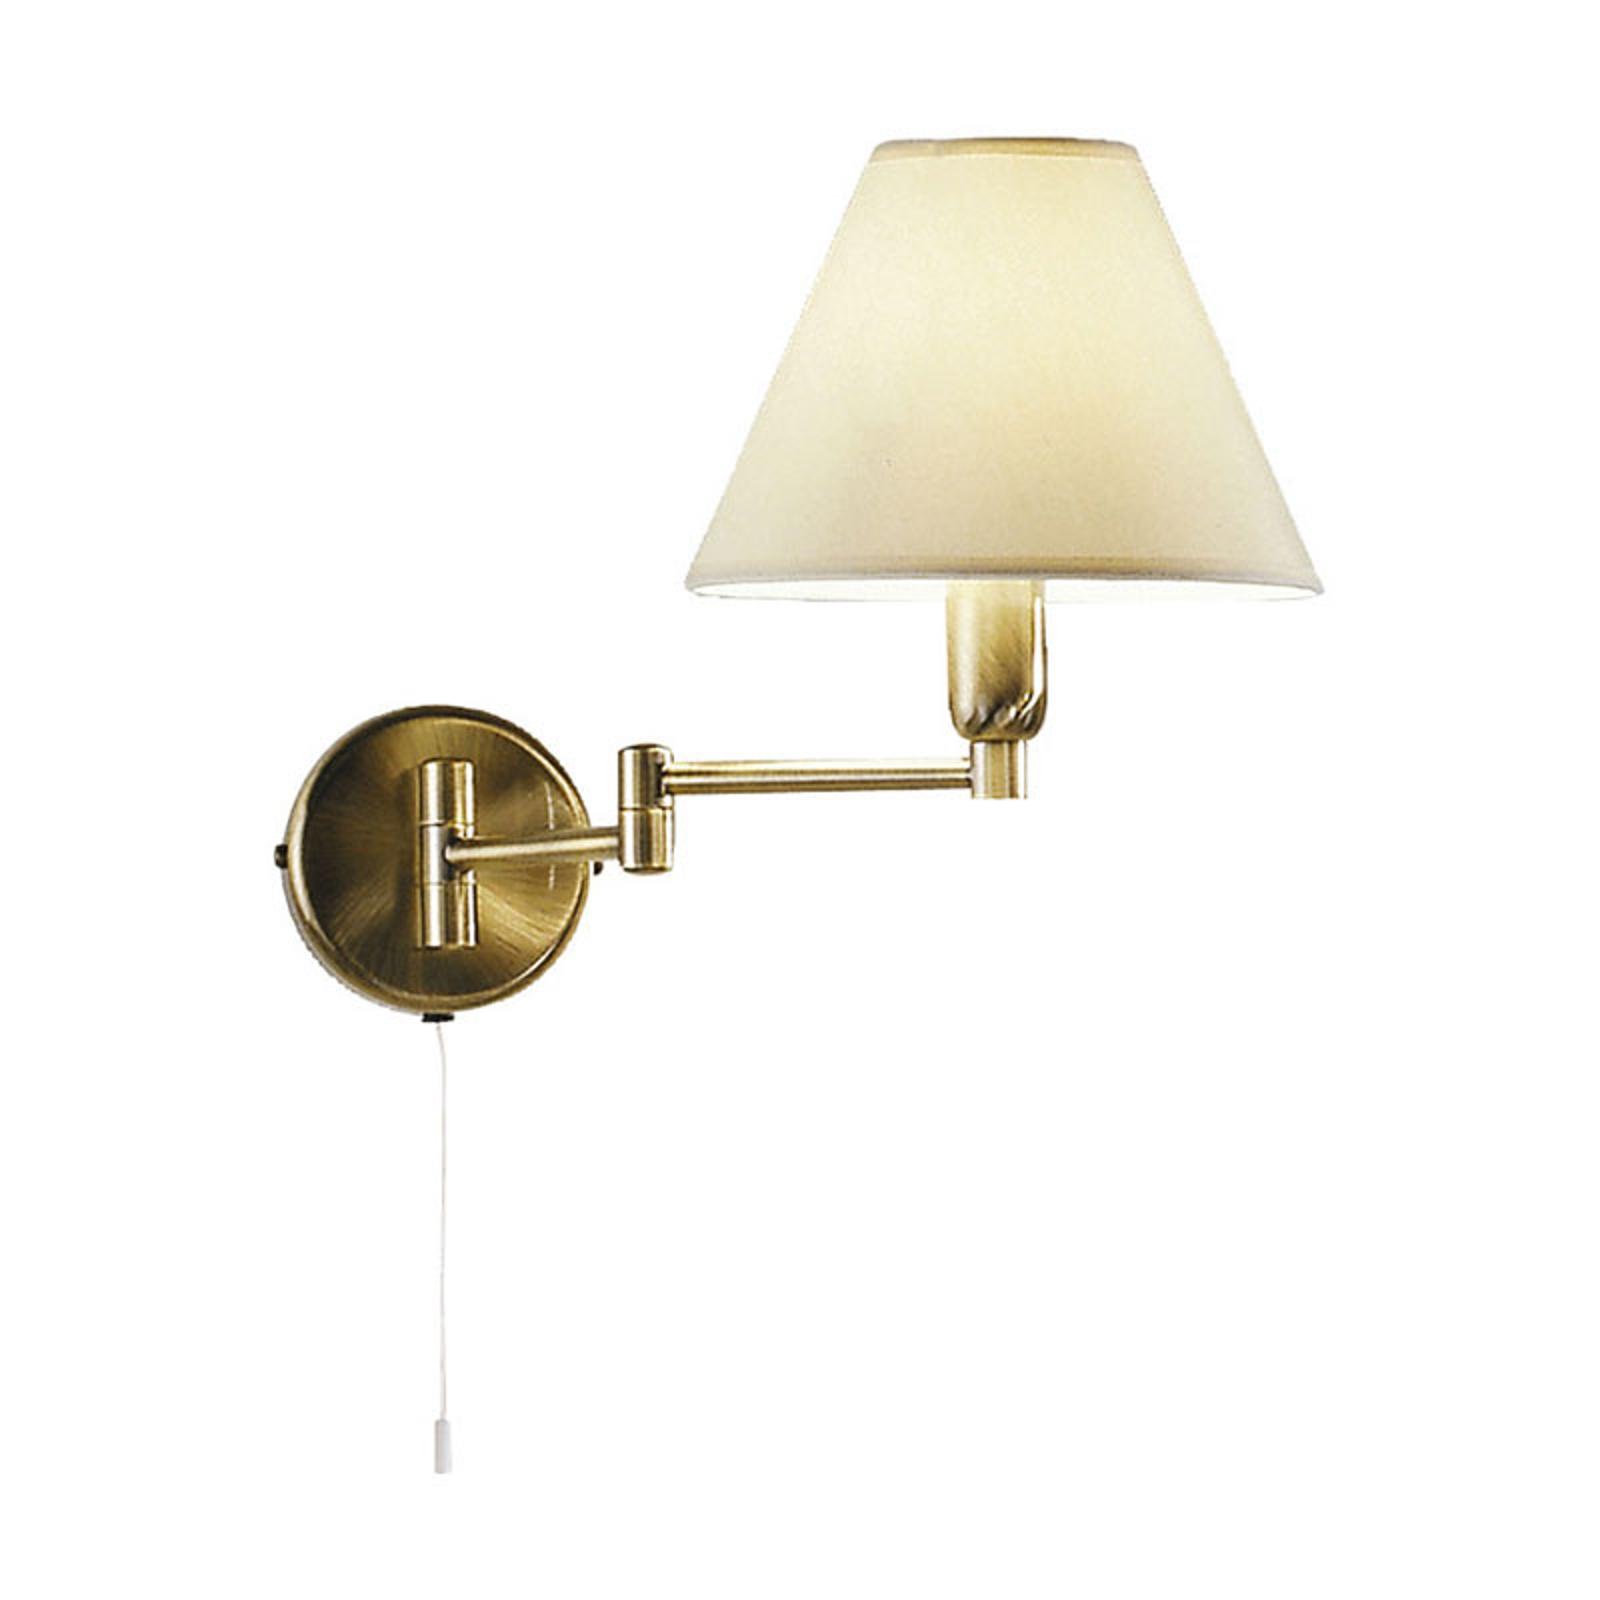 Wandlamp Hilton, witte stoffen kap, oudmessing